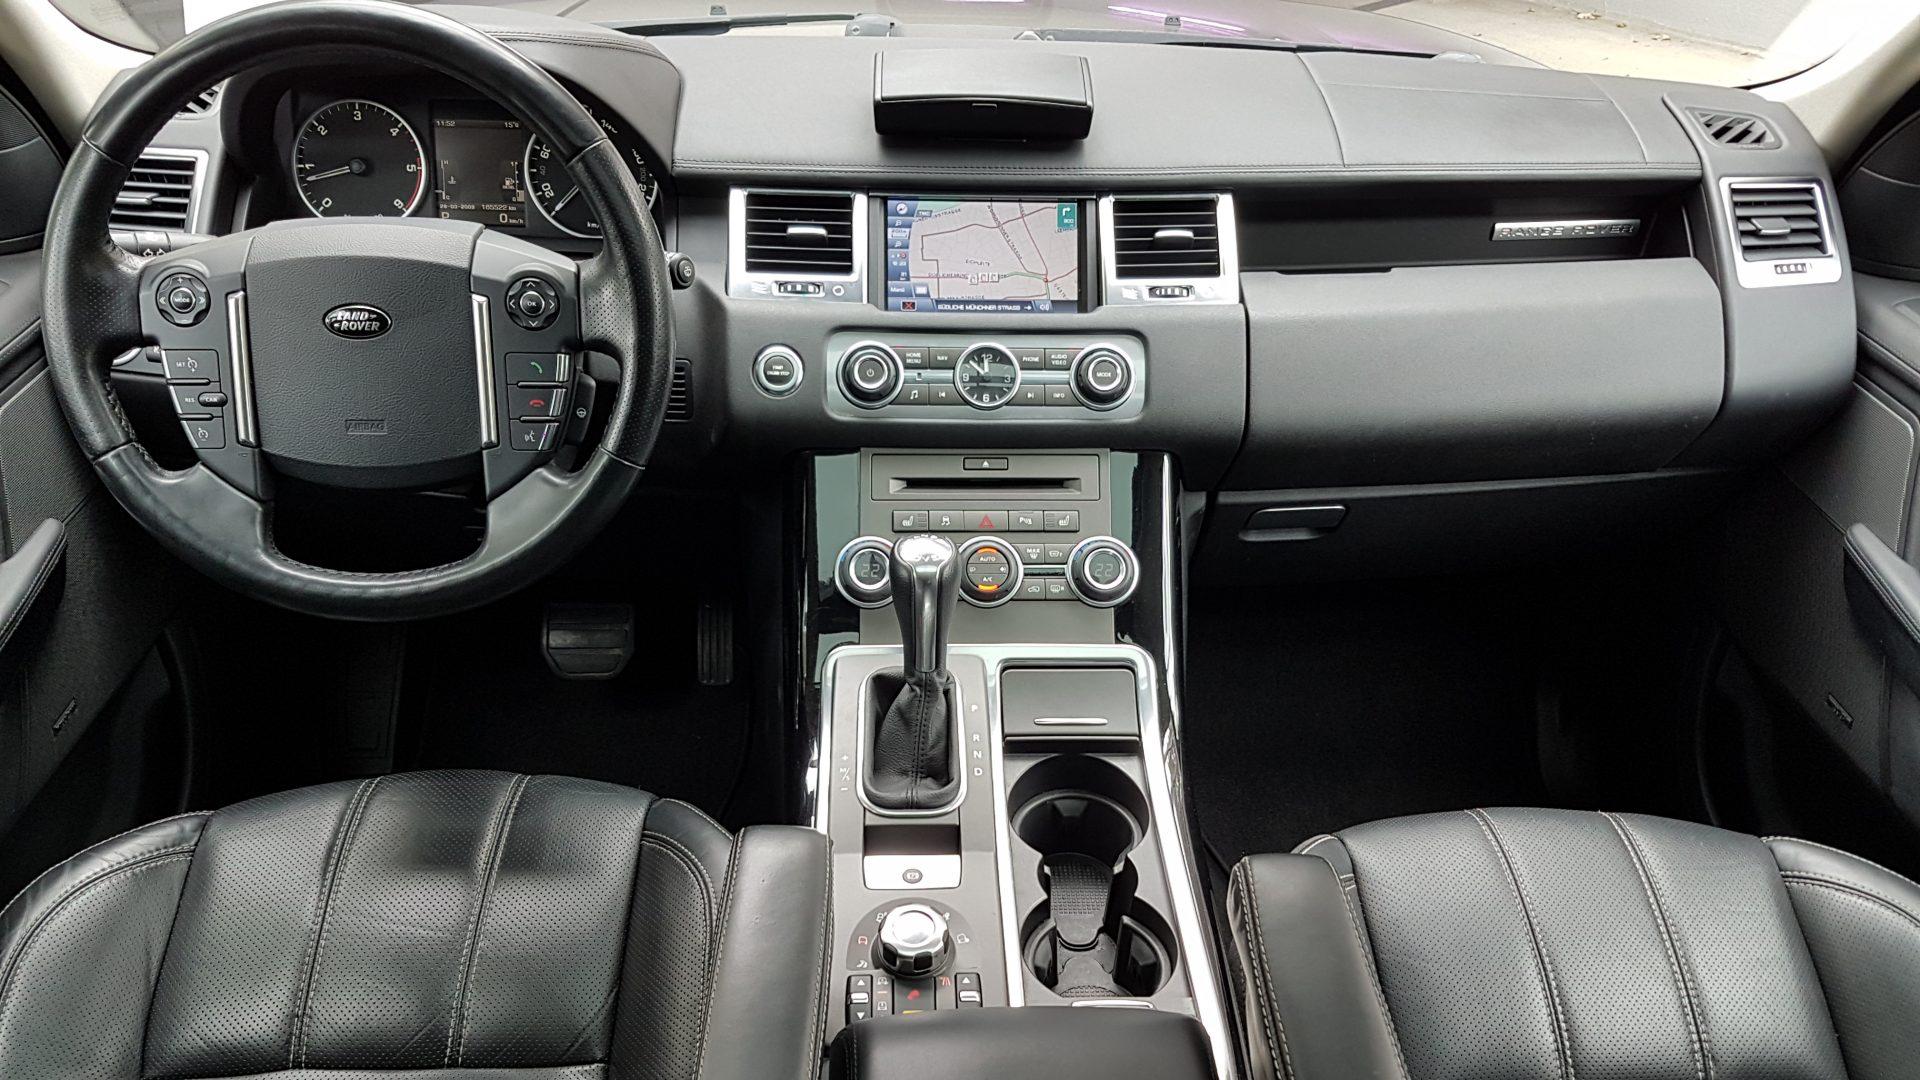 AIL Land Rover Range Rover Sport TDV8 HSE 5